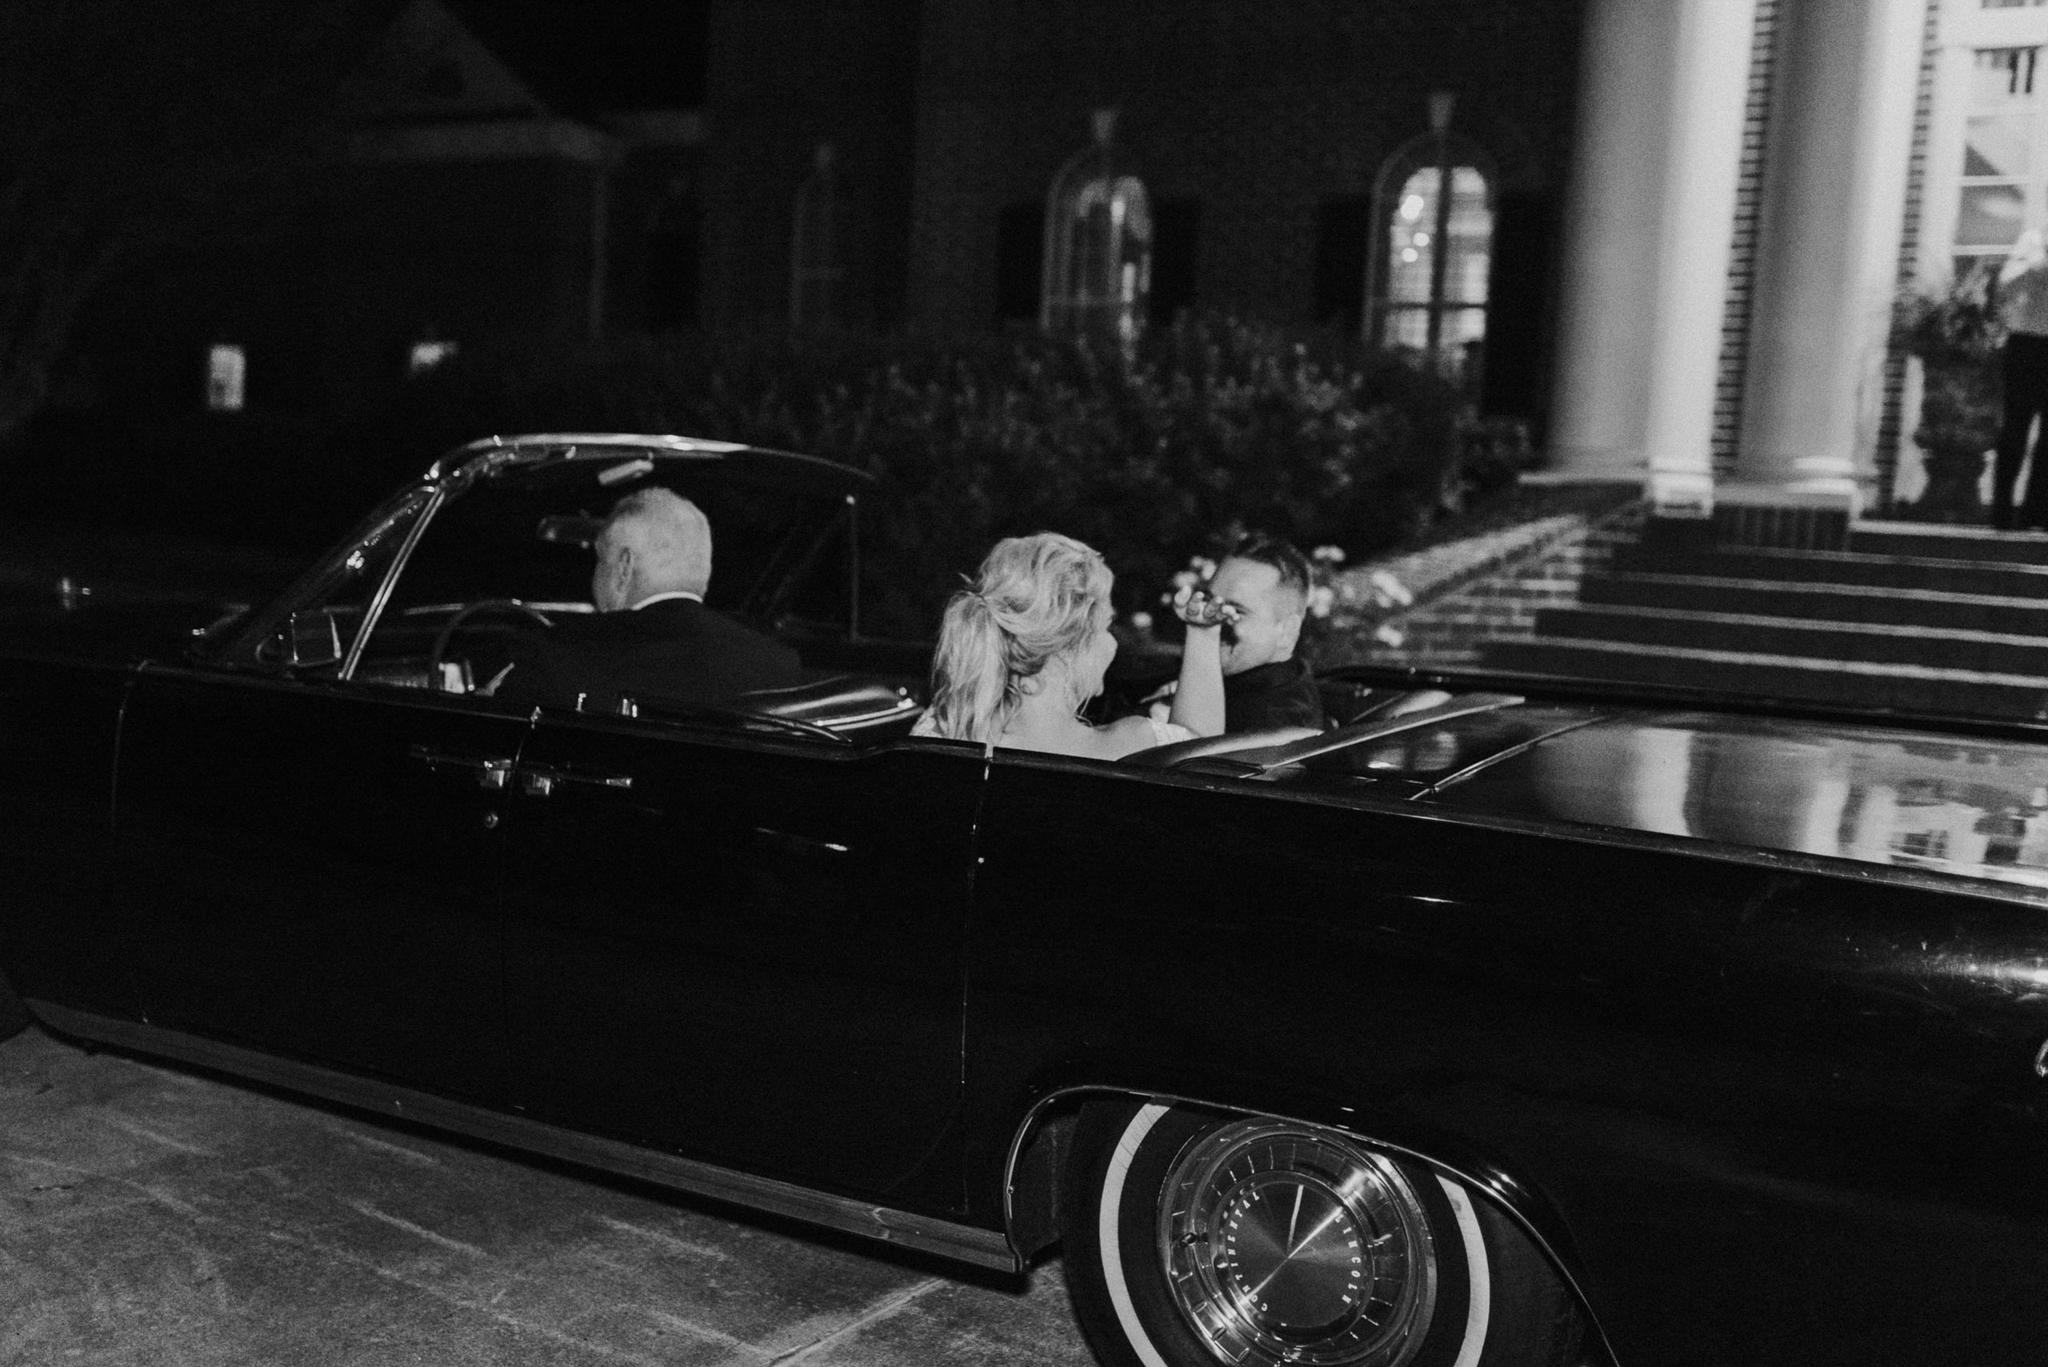 Houston Wedding Photographer-Intimate Texas Backyard Wedding- Houston Wedding Photographer -Kristen Giles Photography-61.jpg